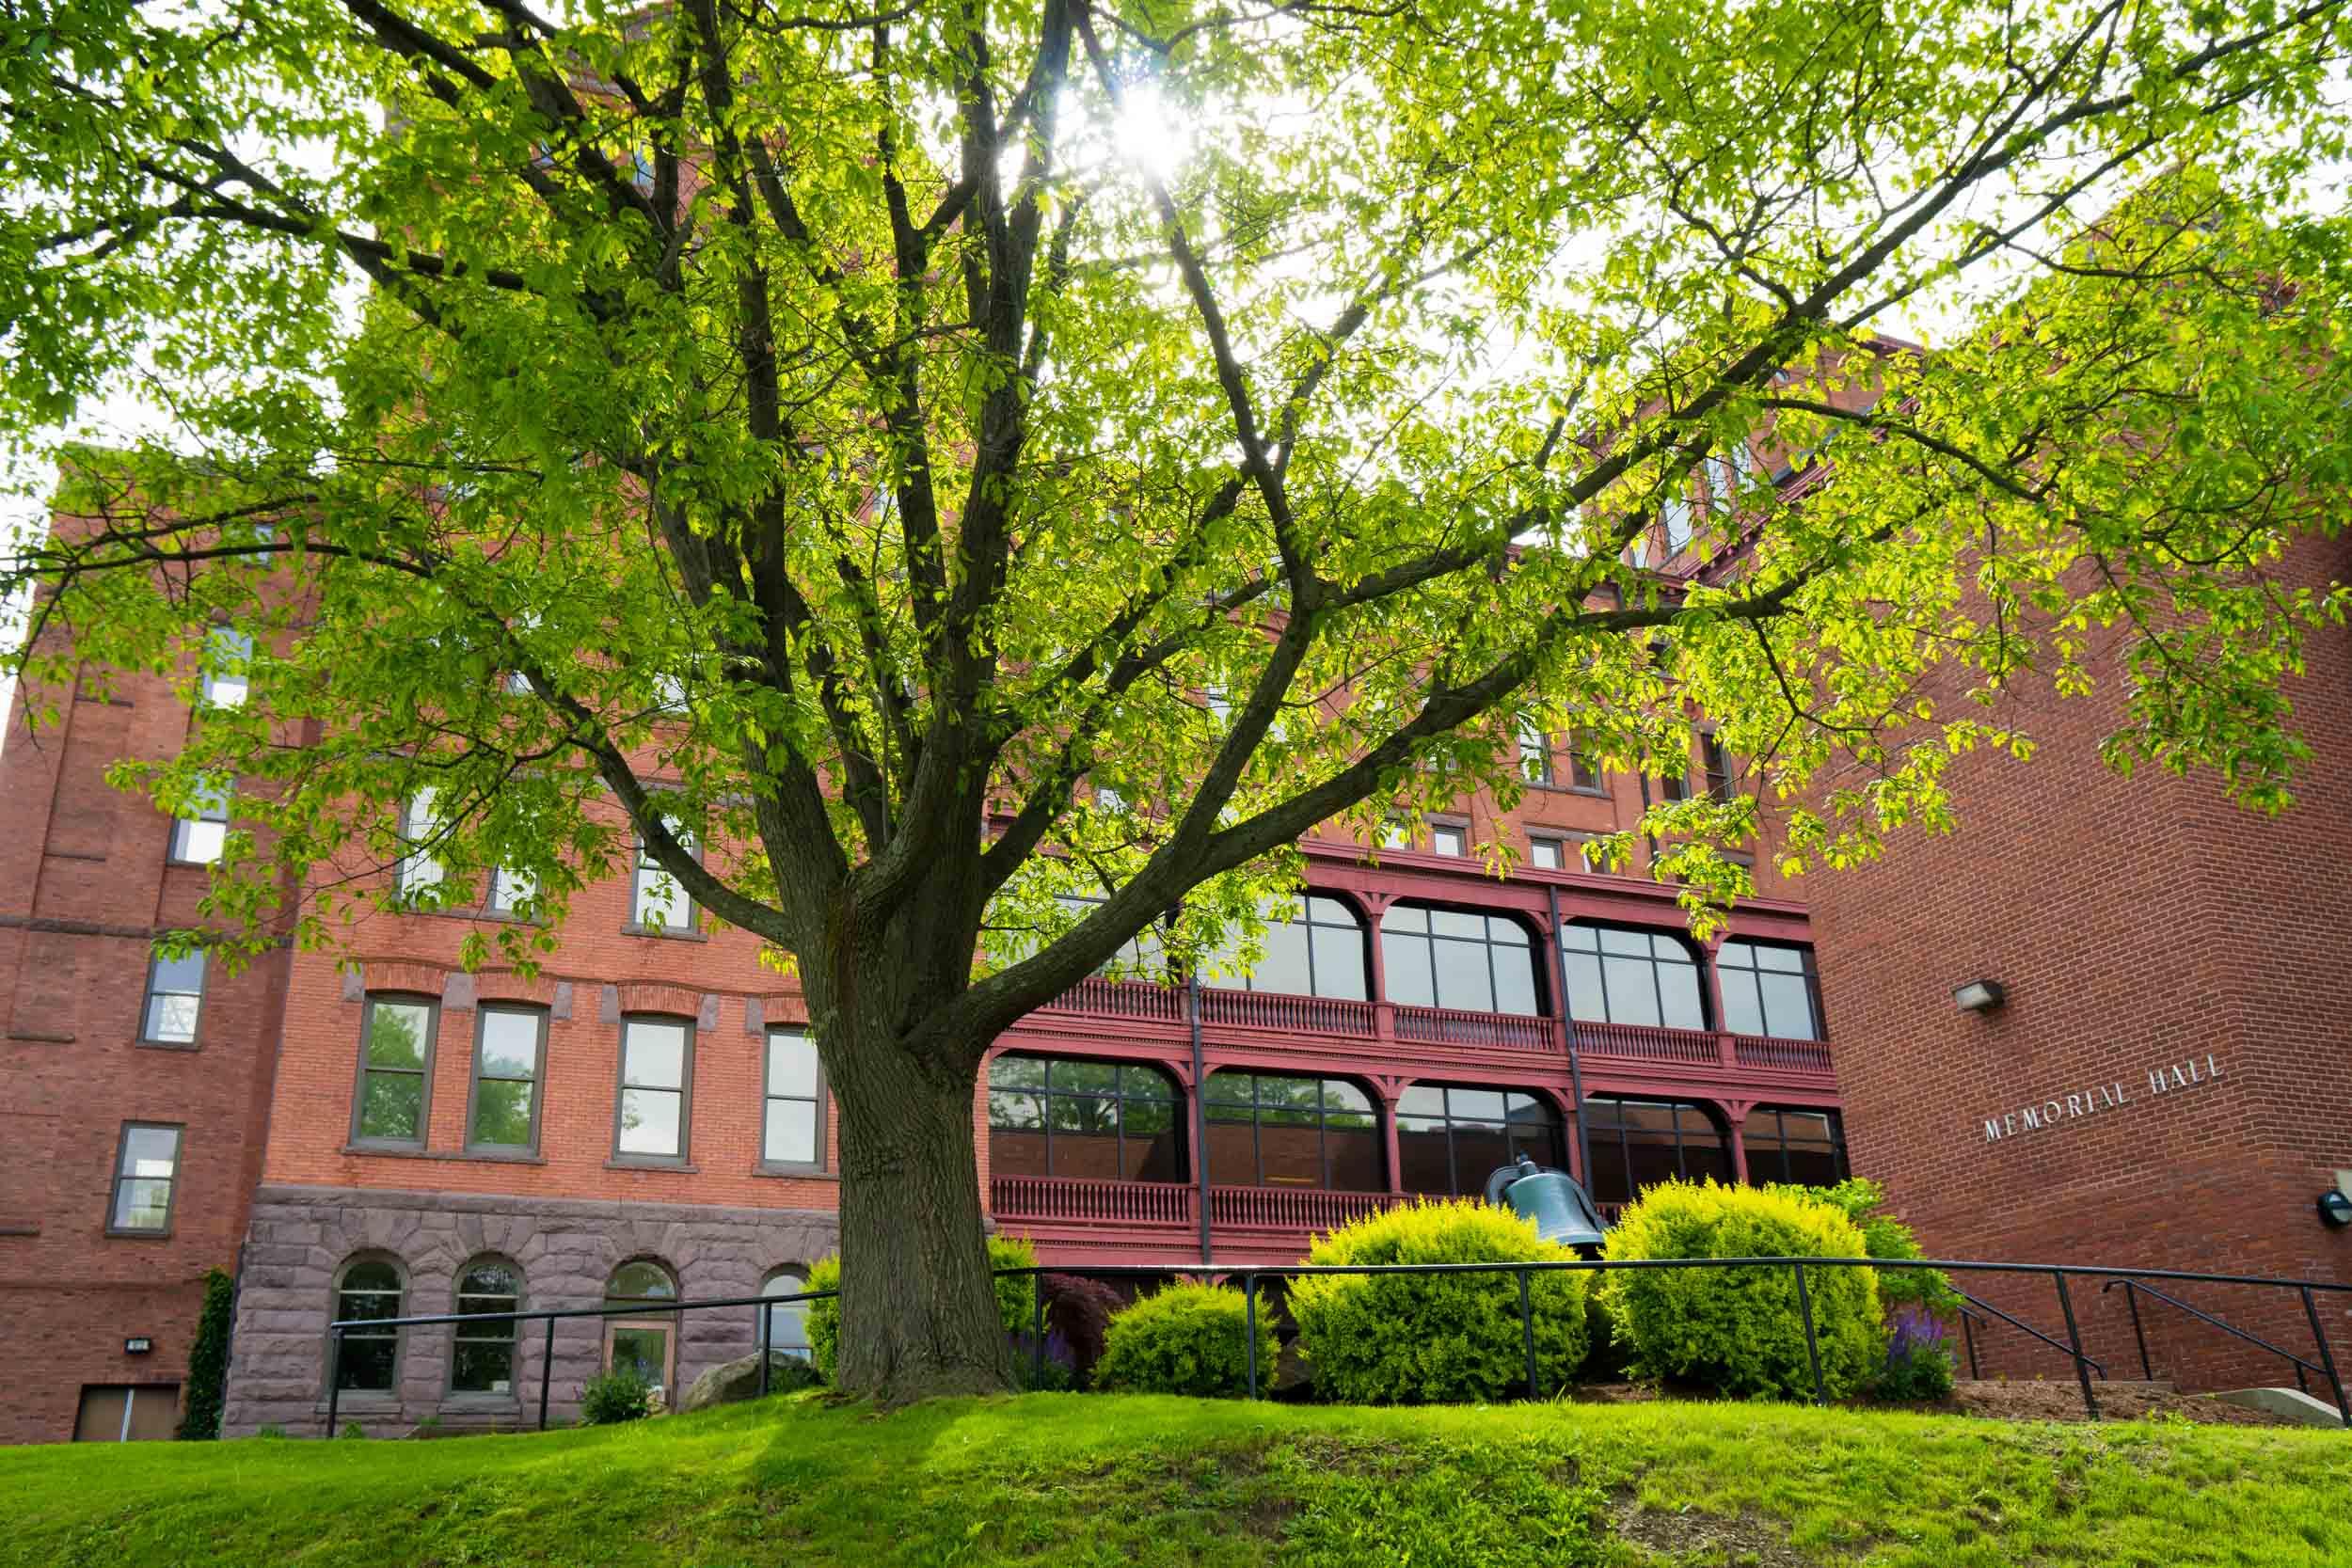 Mansfield University - Mansfield, PA